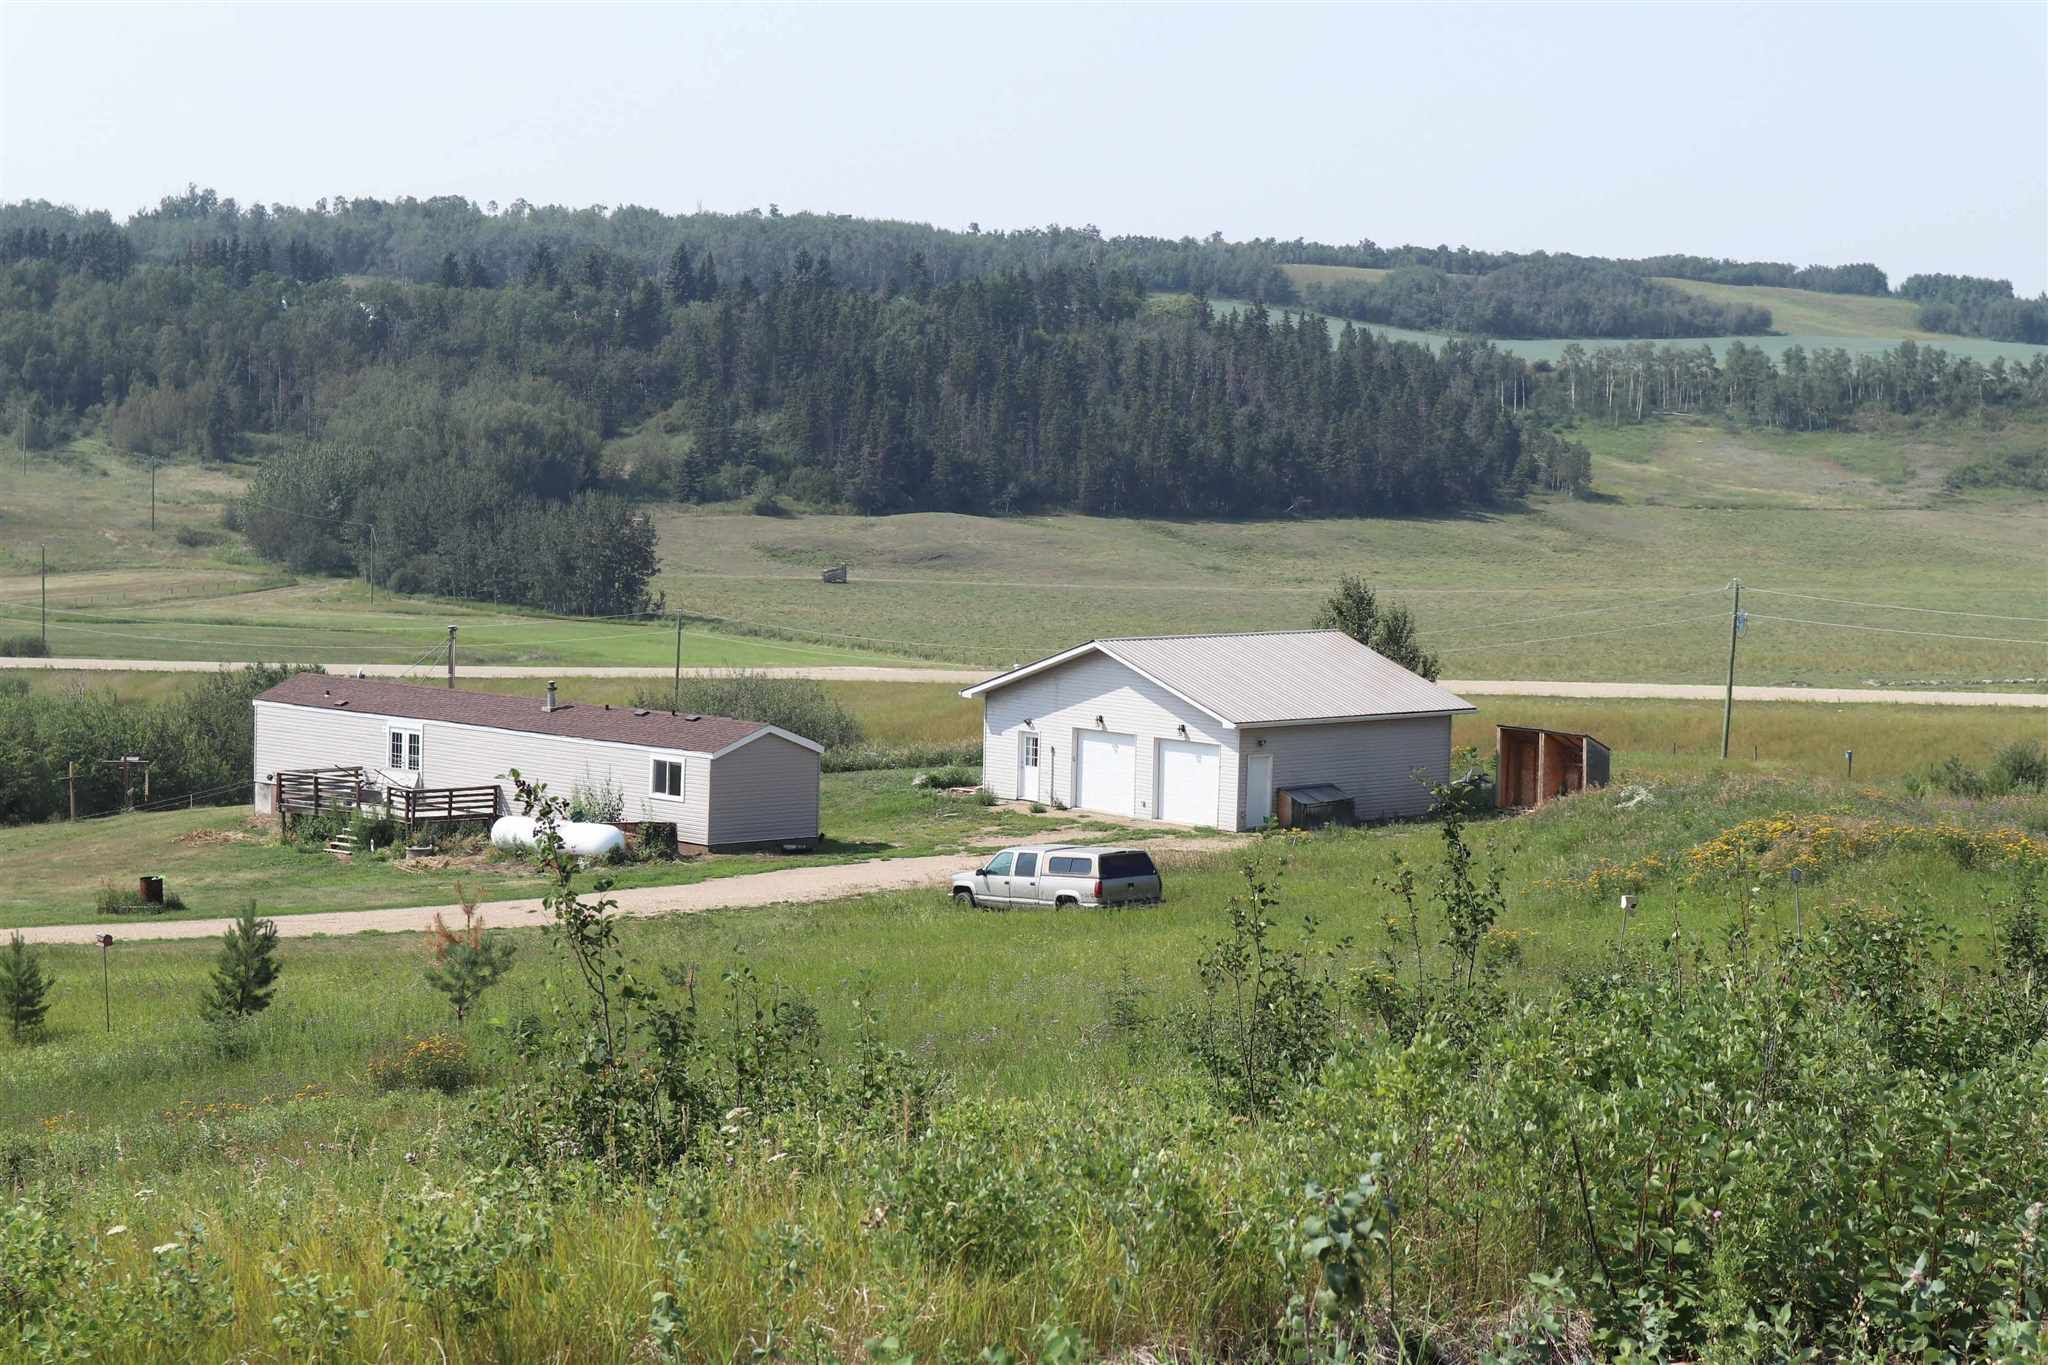 Main Photo: 23509 Twp 484: Rural Leduc County House for sale : MLS®# E4258040